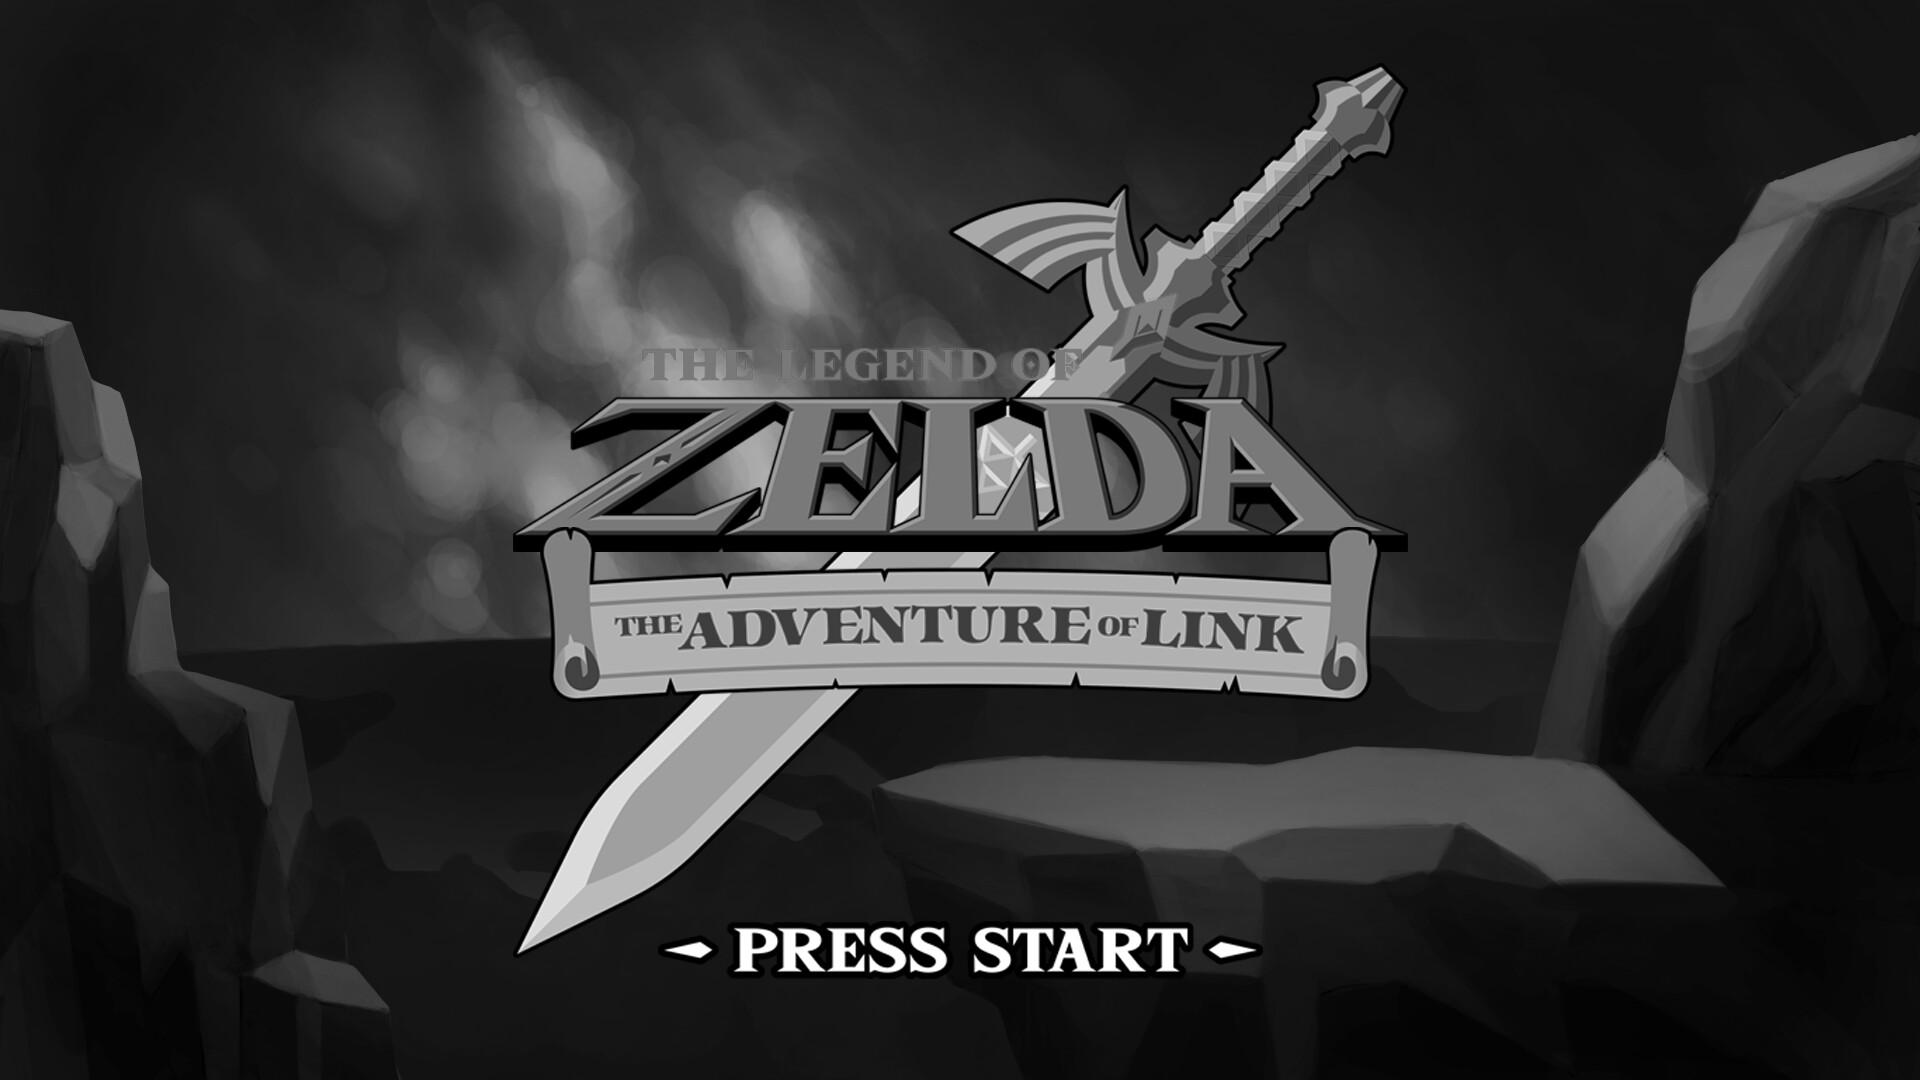 Daniel bernal zelda 2 the adventure of link 4 bw